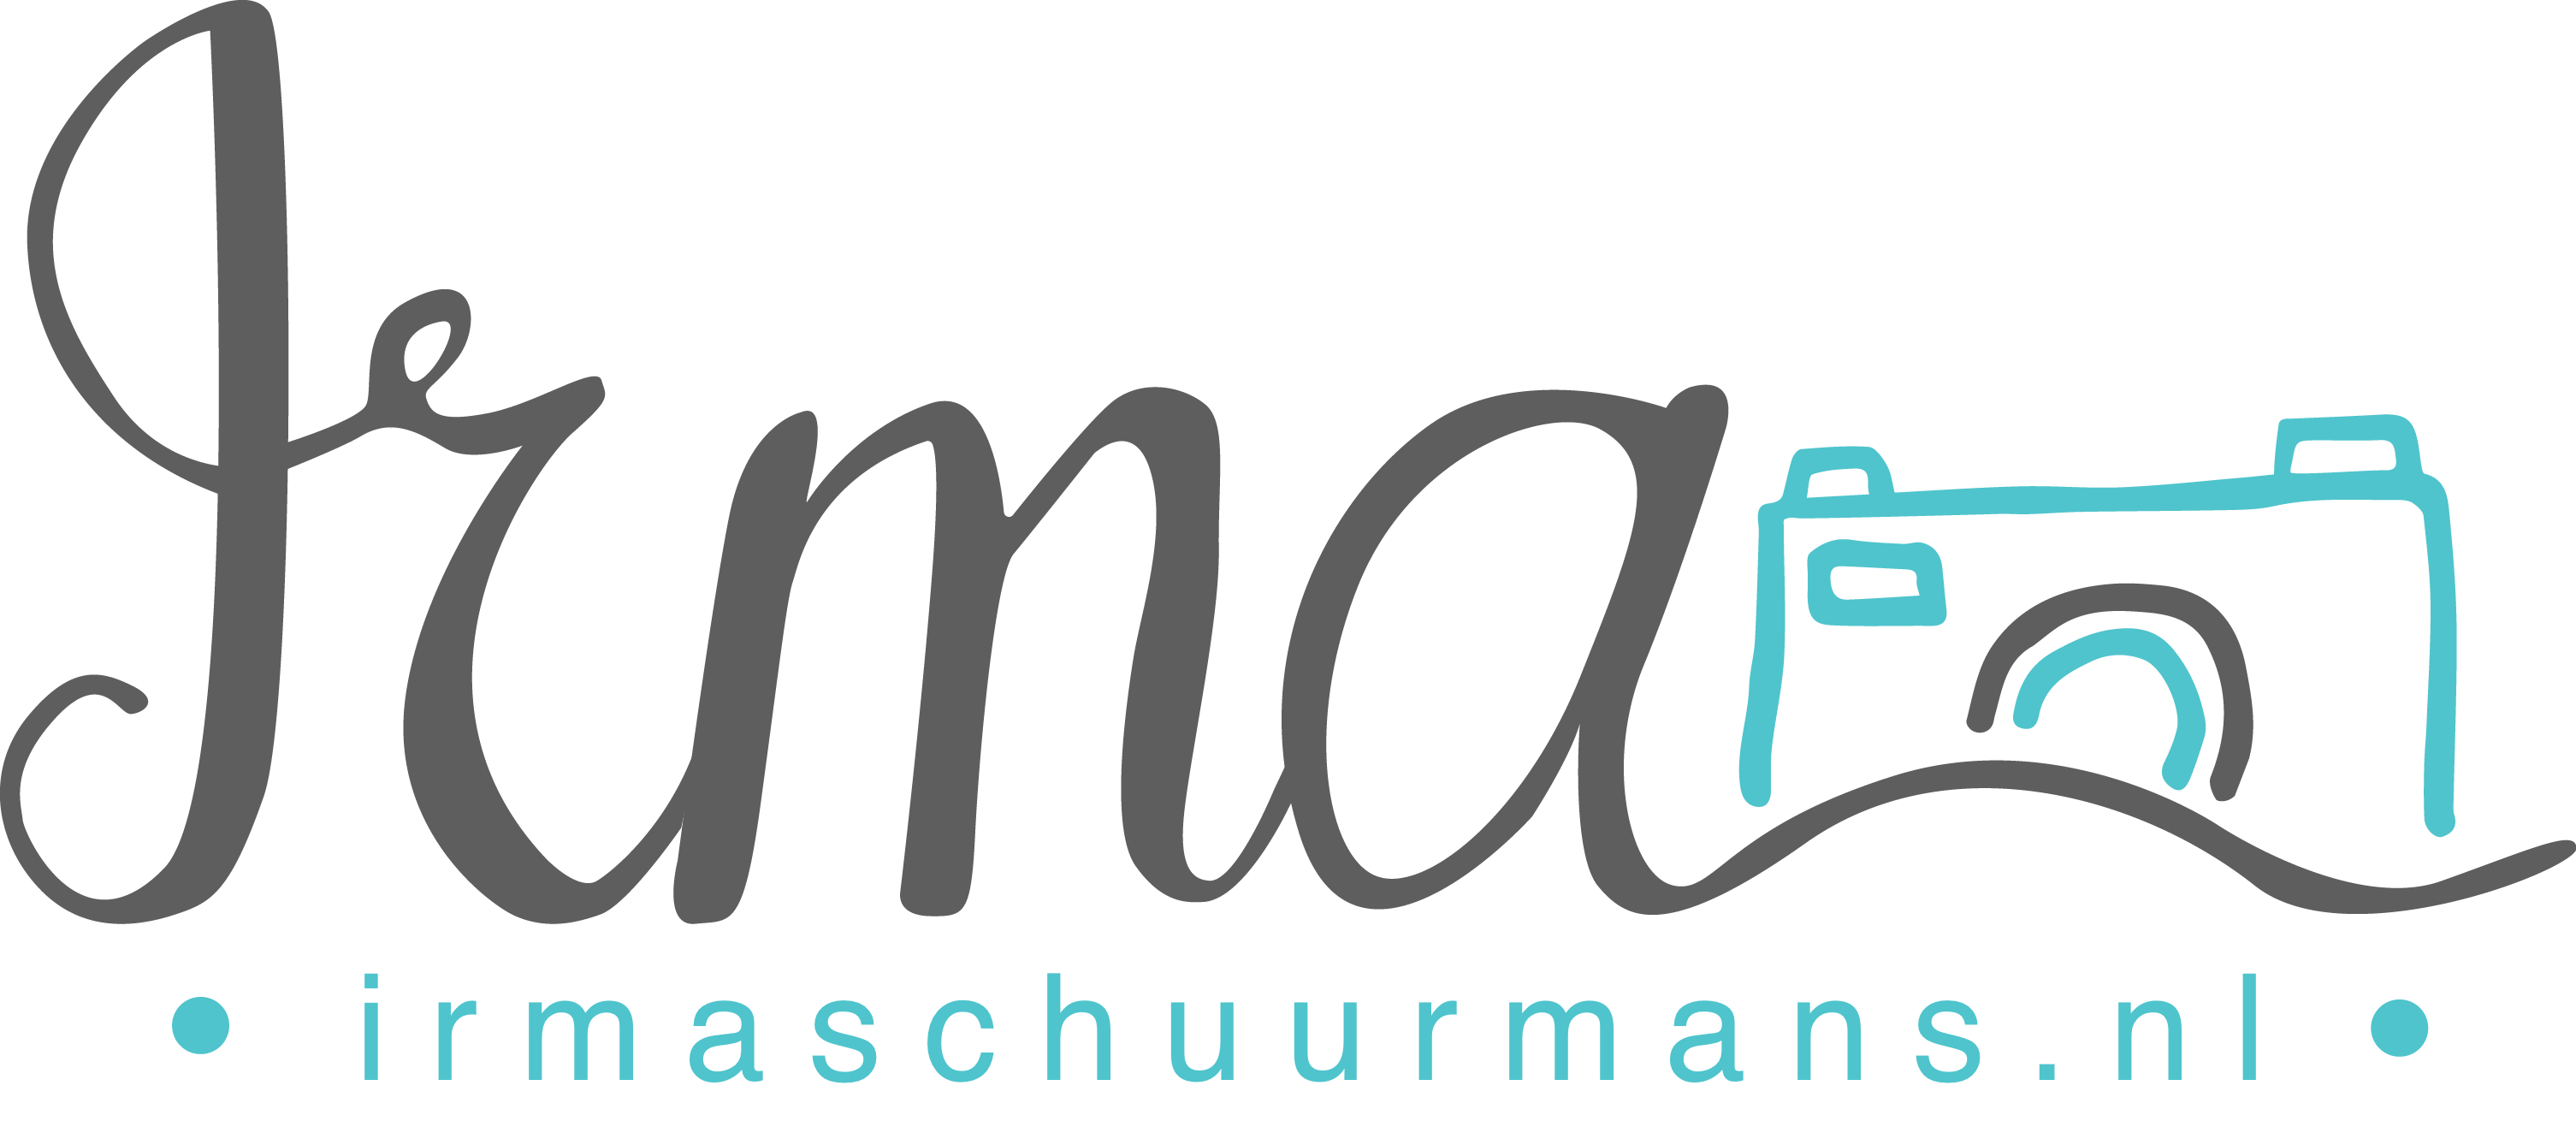 Irma Schuurmans Fotografie & Fotoshoots